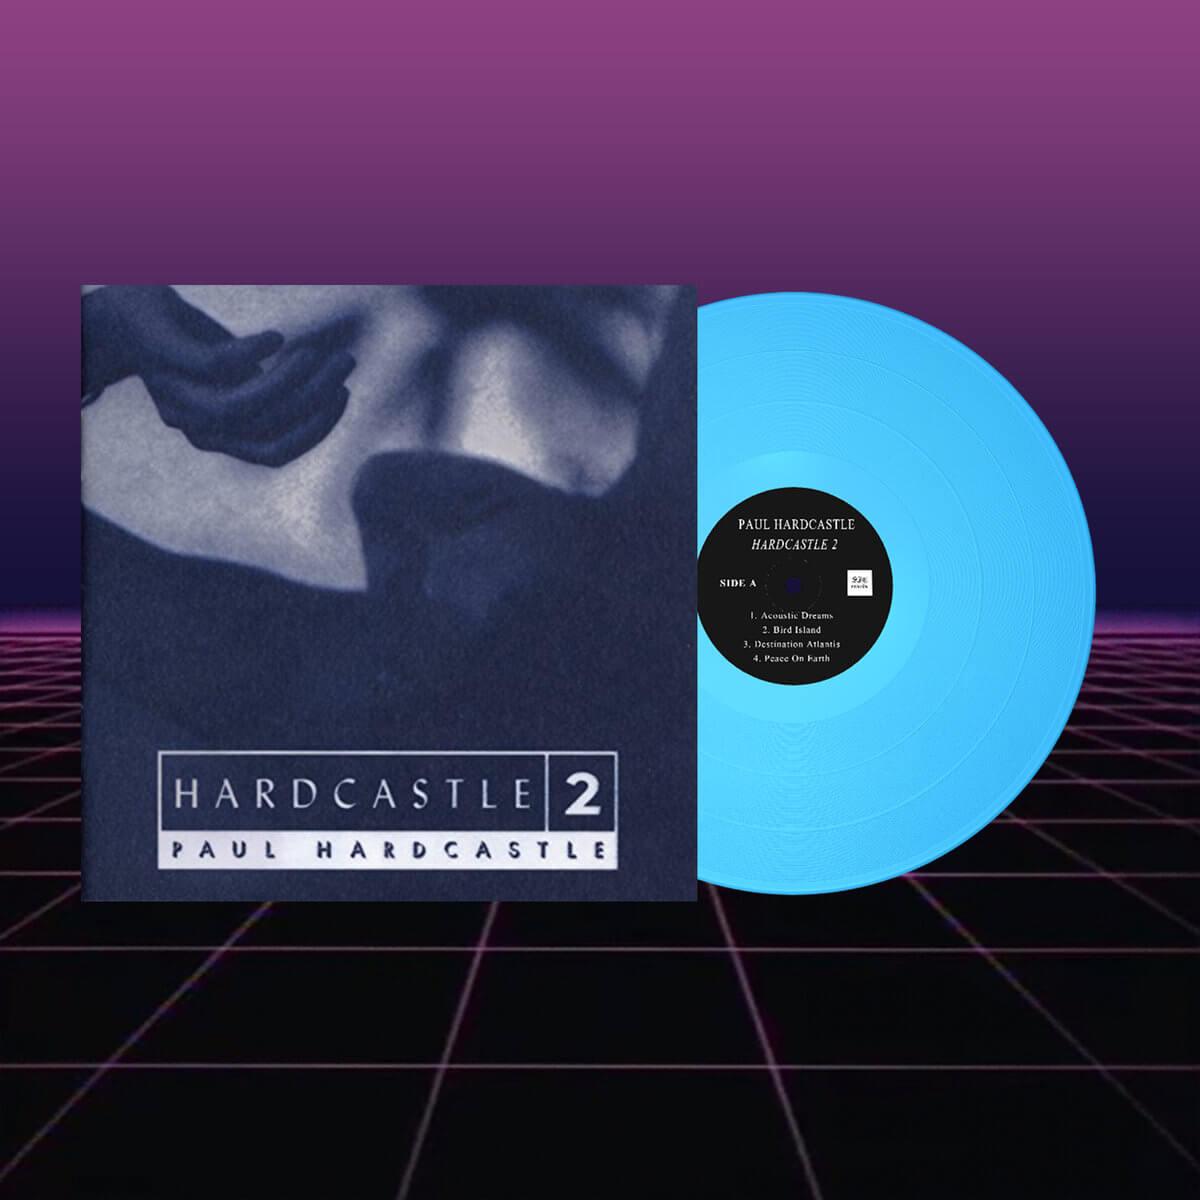 PAUL HARDCASTLE – HARDCASTLE 2 (vinyl)